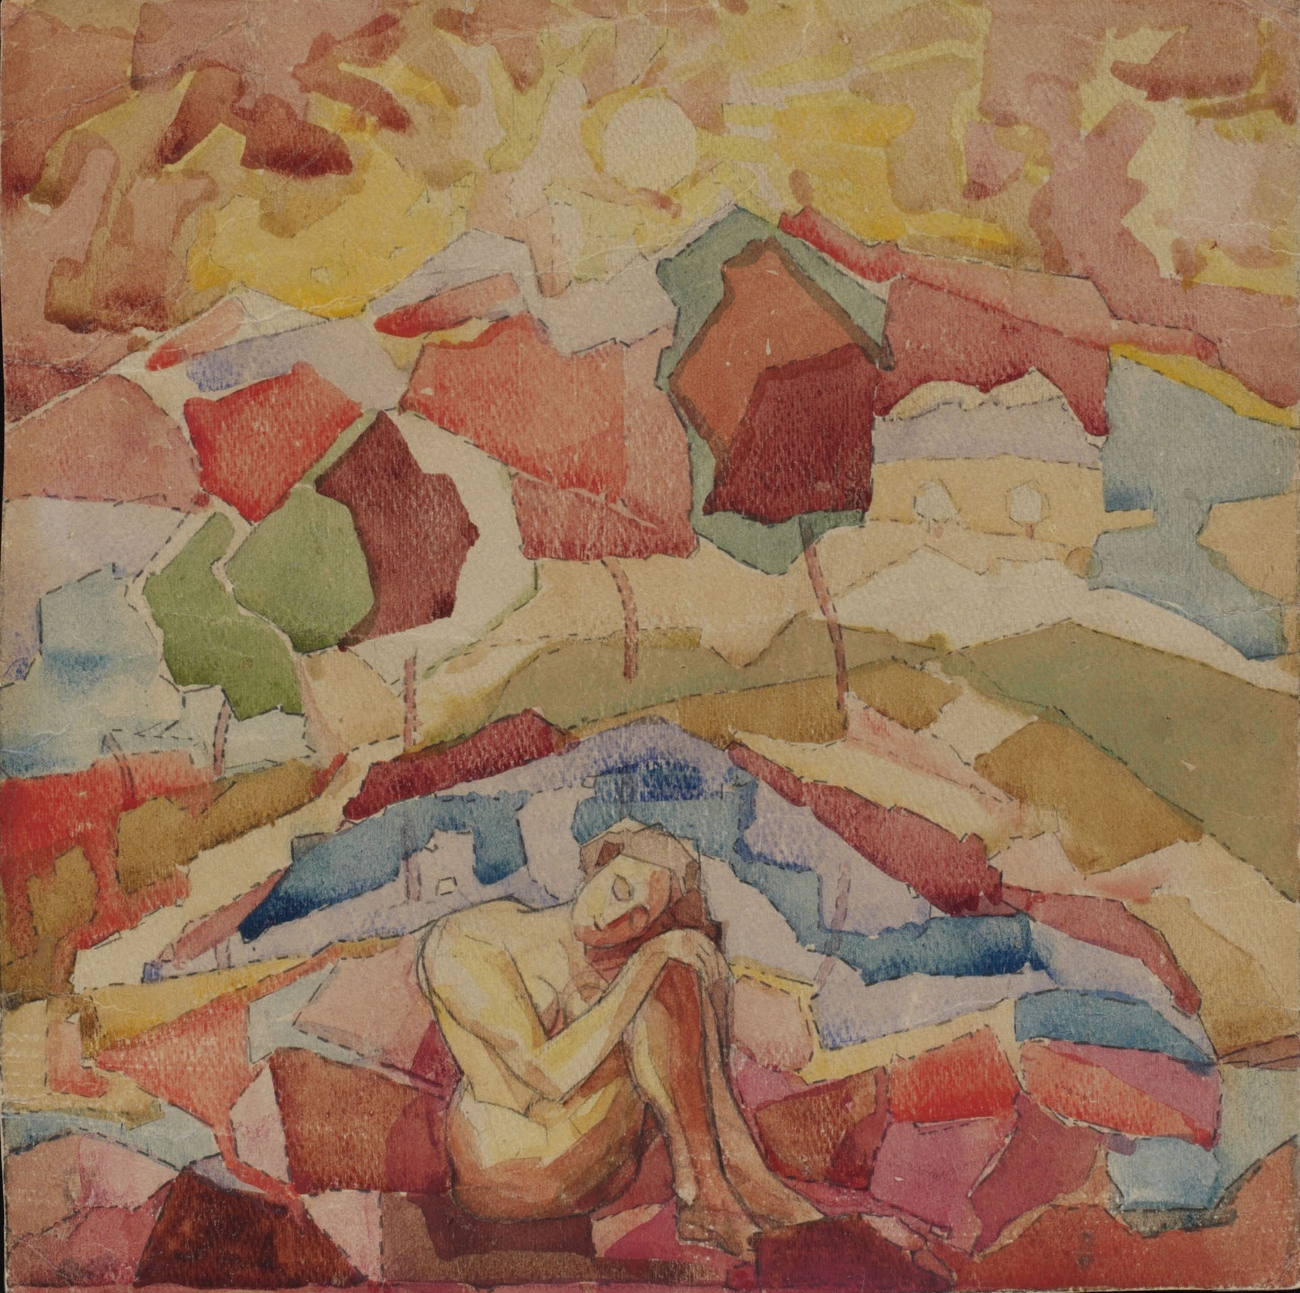 Nude in a mountainous landscape, 1915 - Alexander Volkov